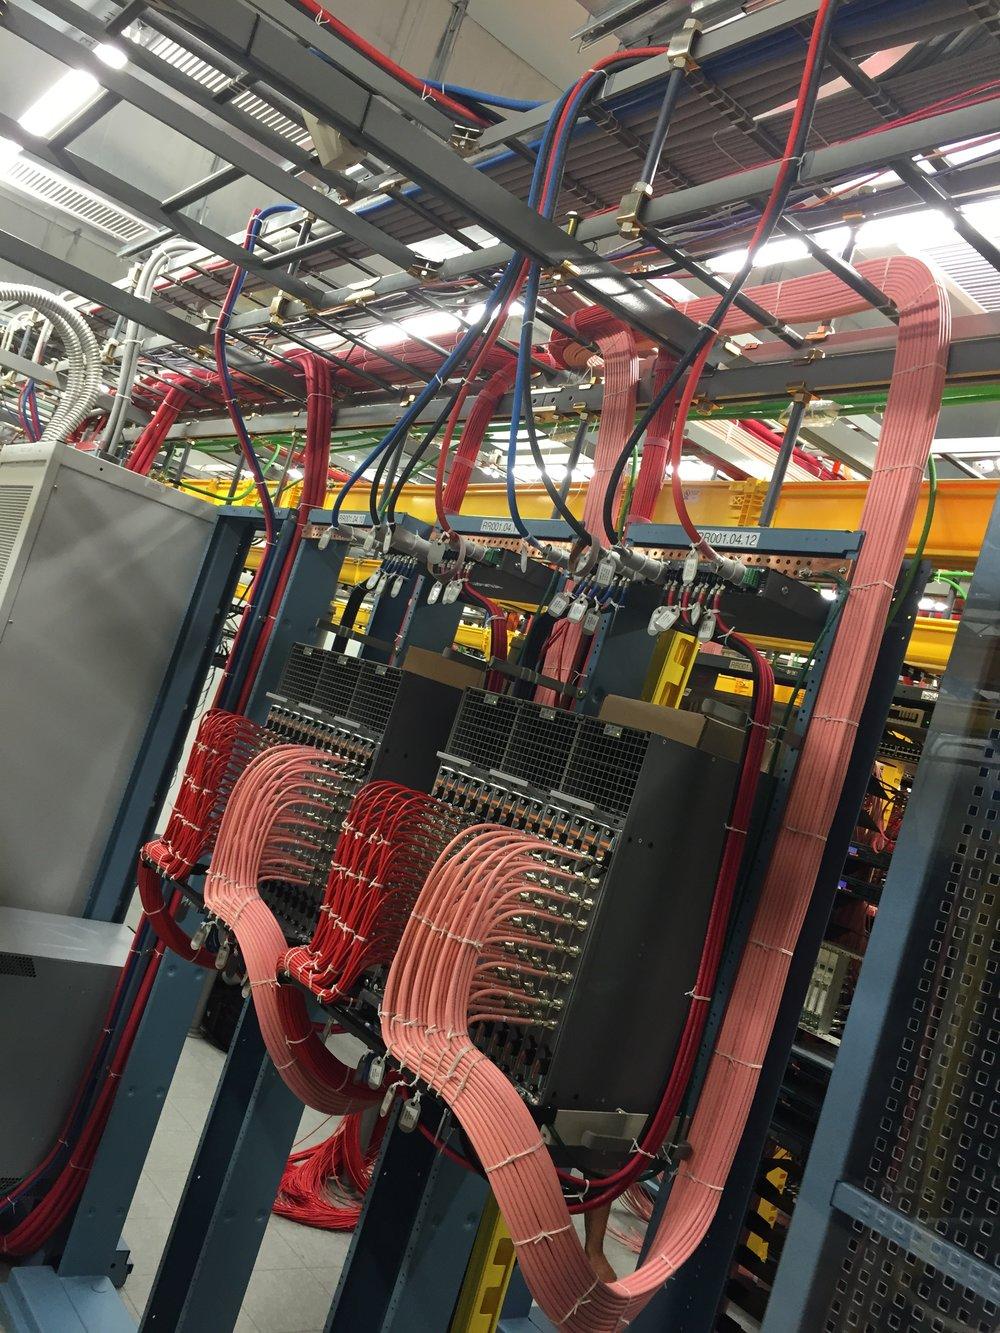 Low Voltage Wiring Blue Cable Home La